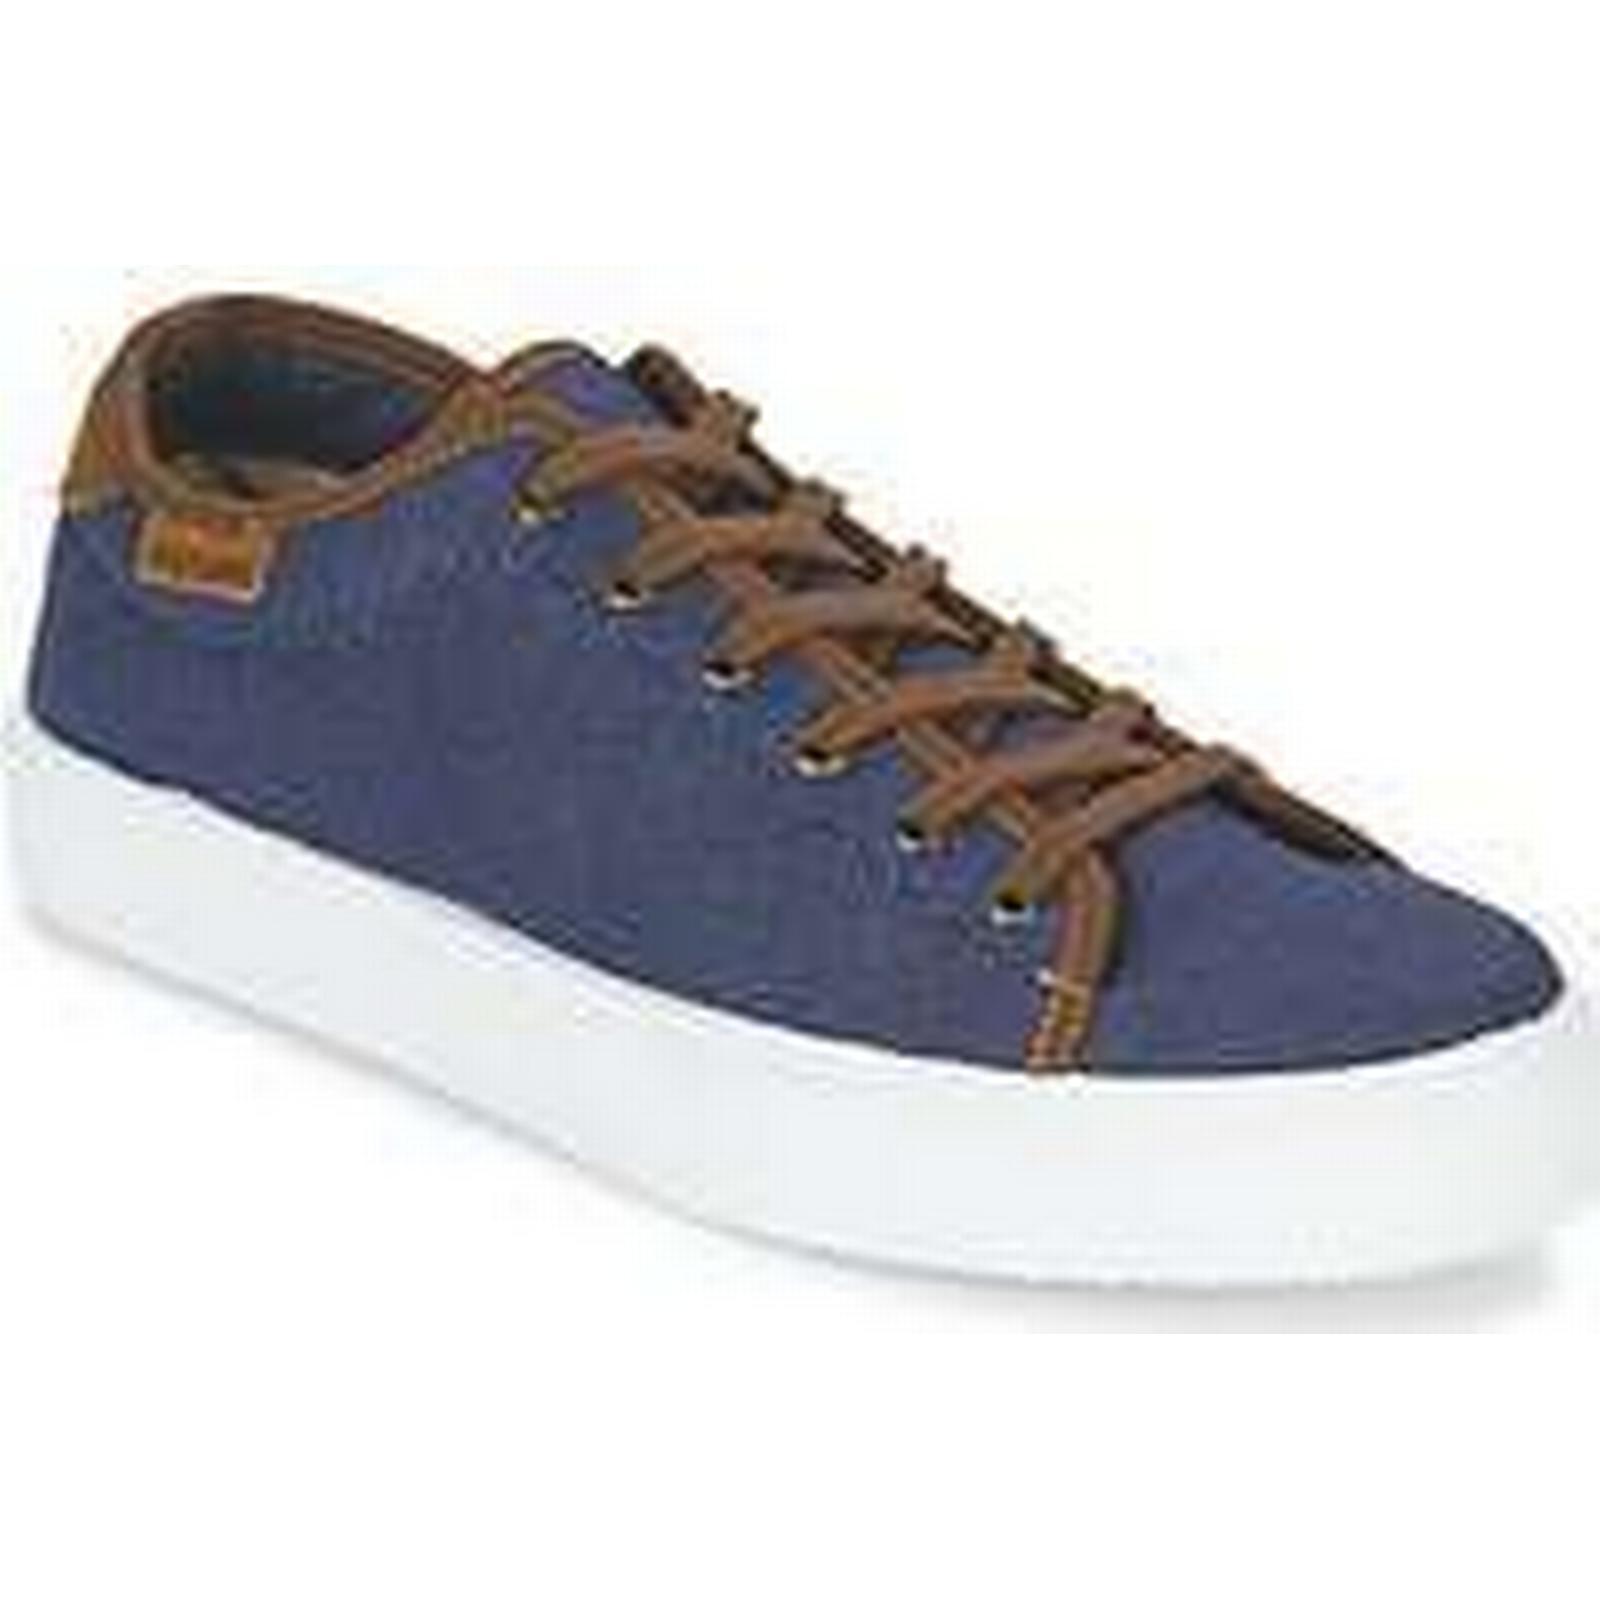 Spartoo.co.uk MARRON Victoria BASKET LINO DETALLE MARRON Spartoo.co.uk men's Shoes (Trainers) in Blue 045c54